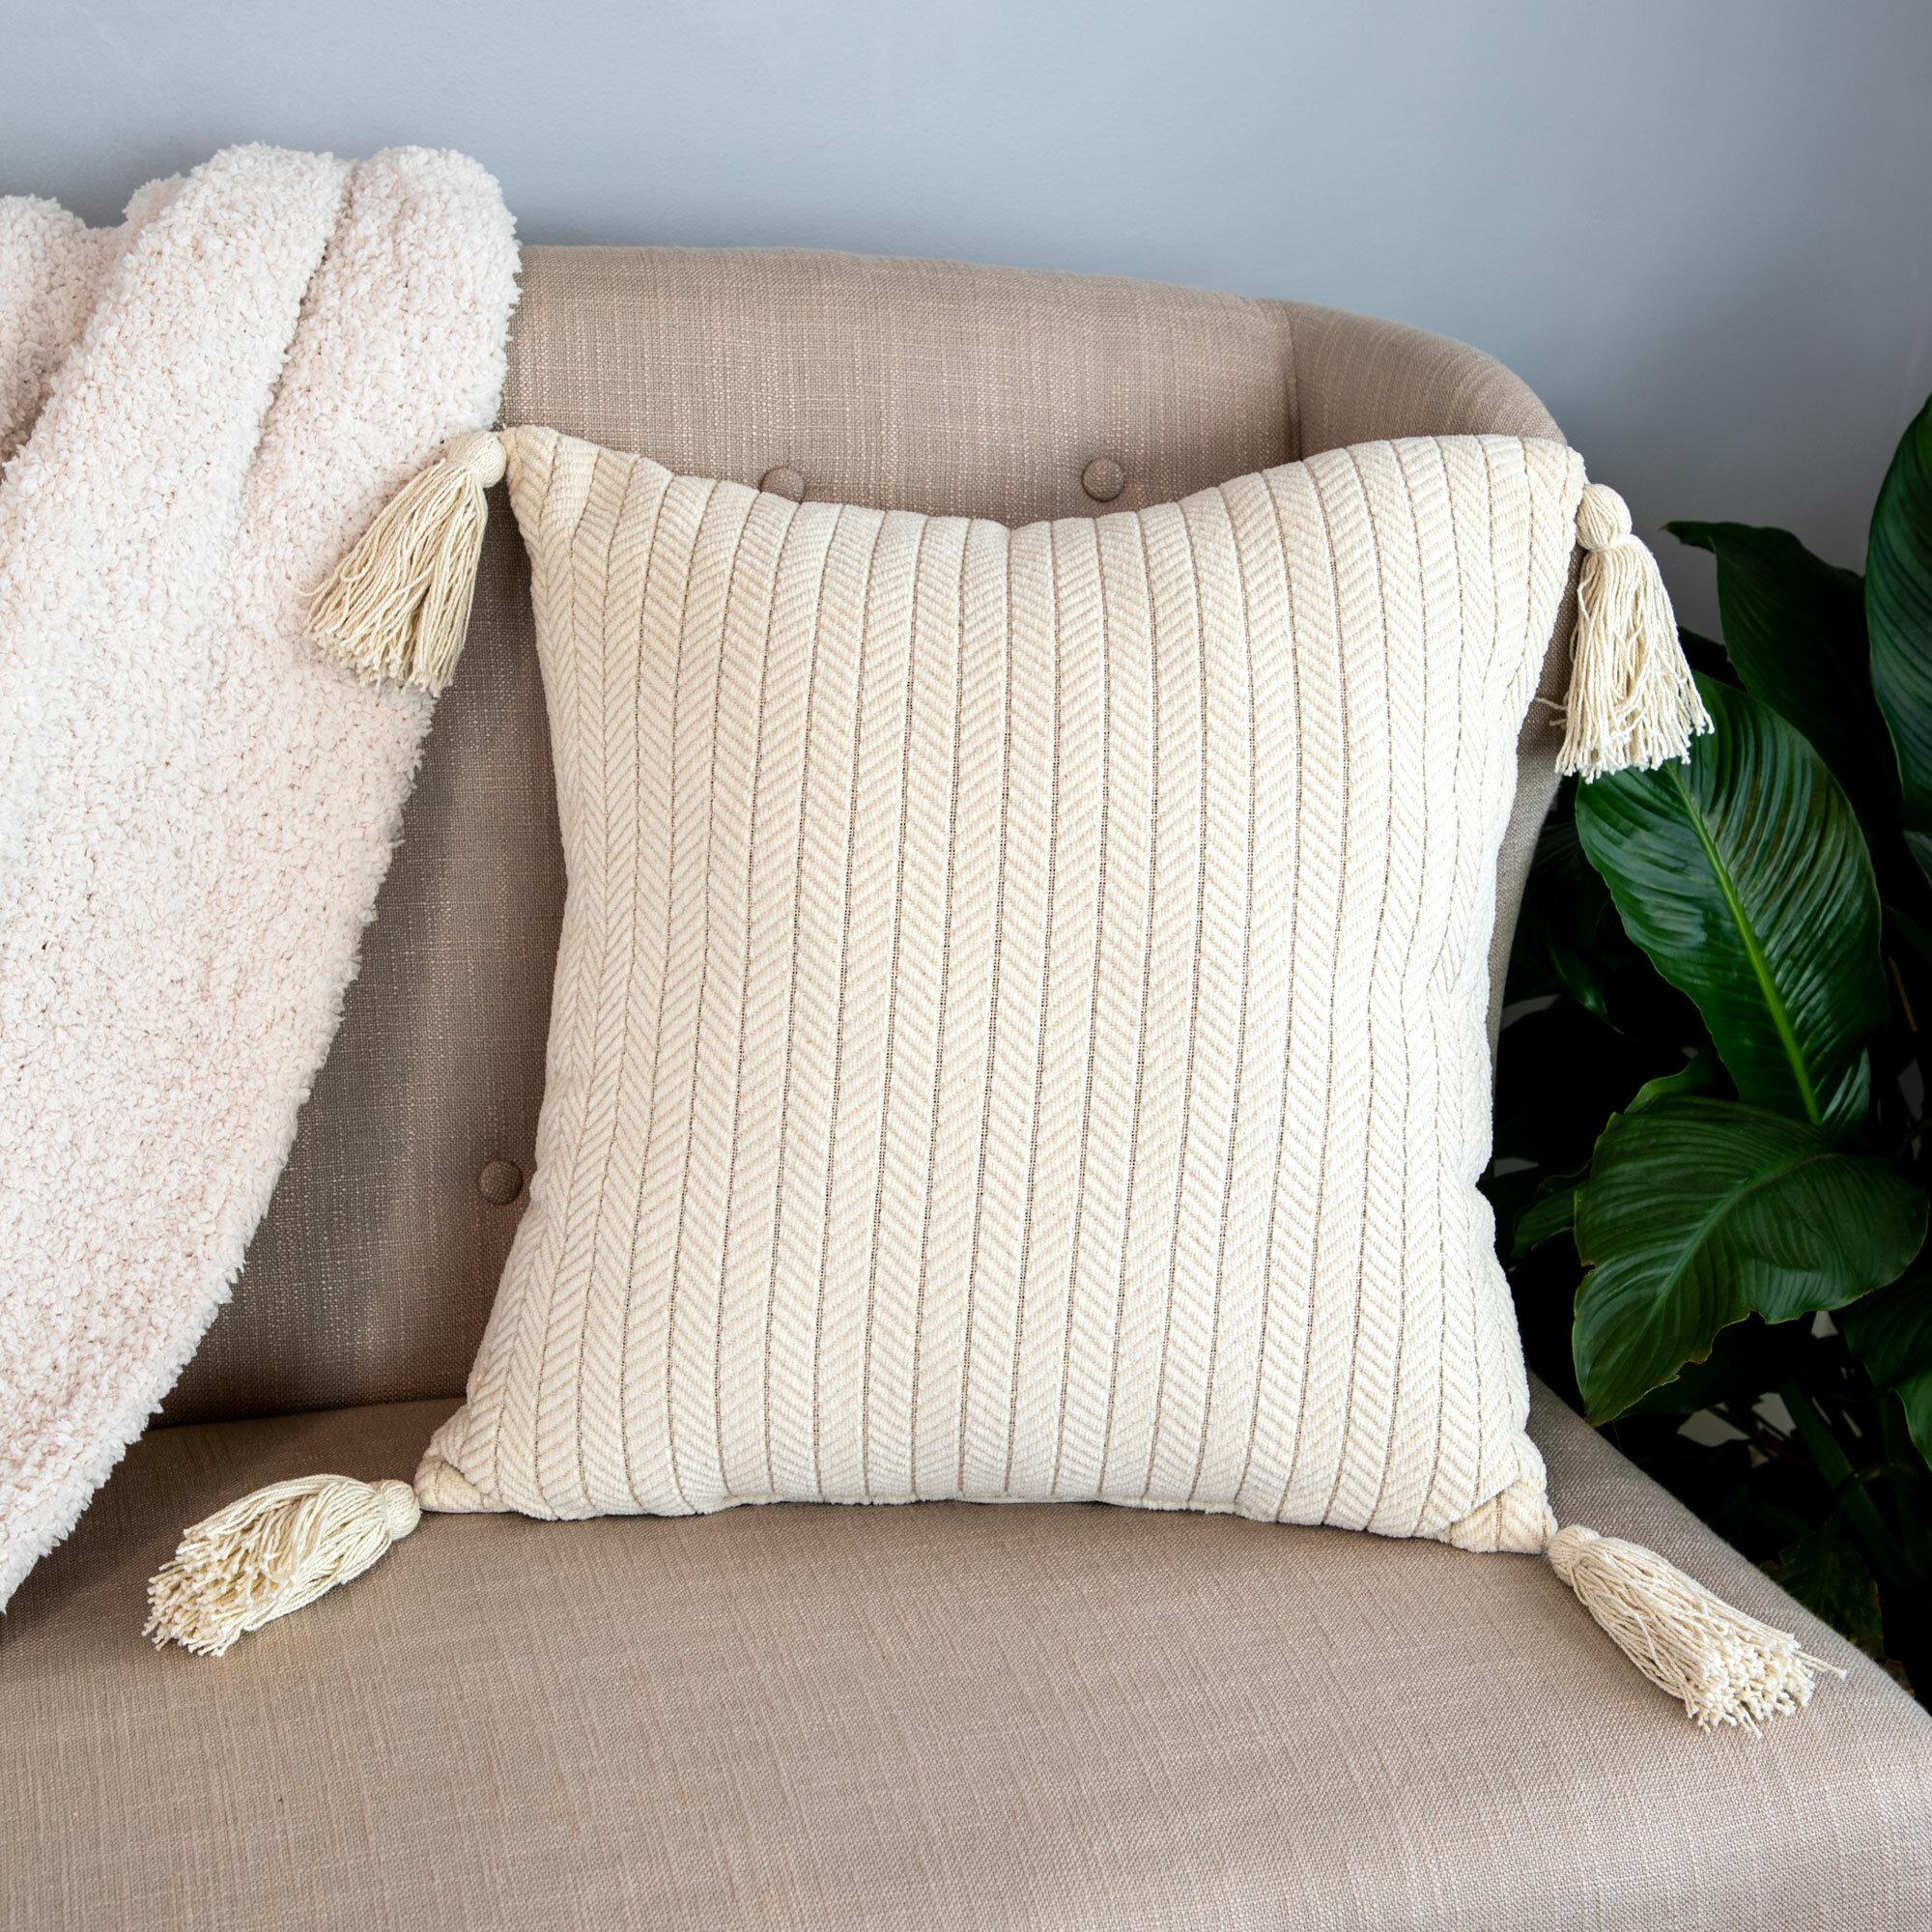 Dakota Fields Decoteau Square Cotton Pillow Cover And Insert Reviews Wayfair